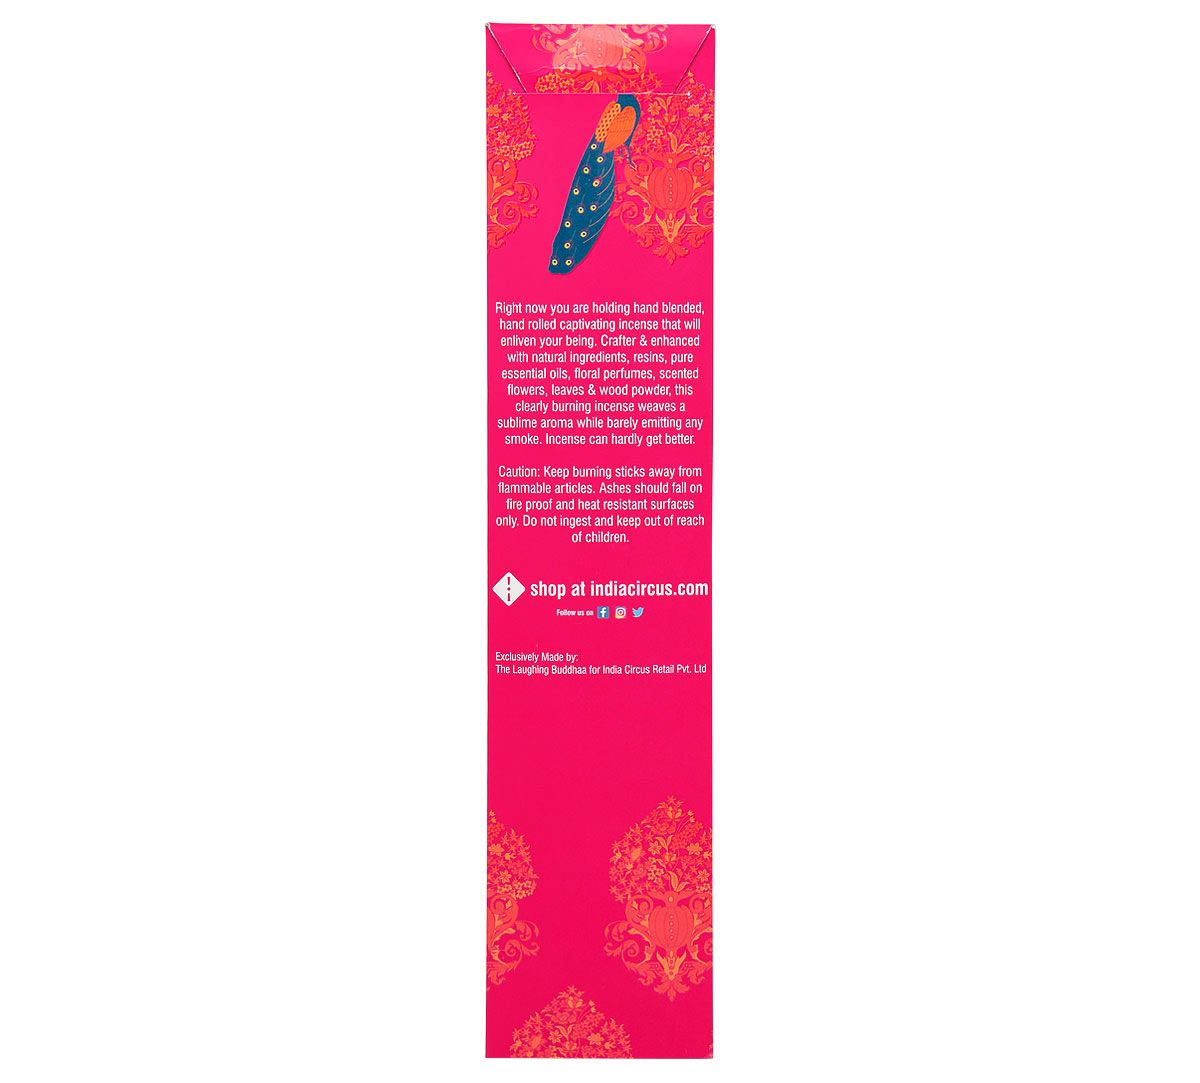 India Circus Sandalwood Incense Stick